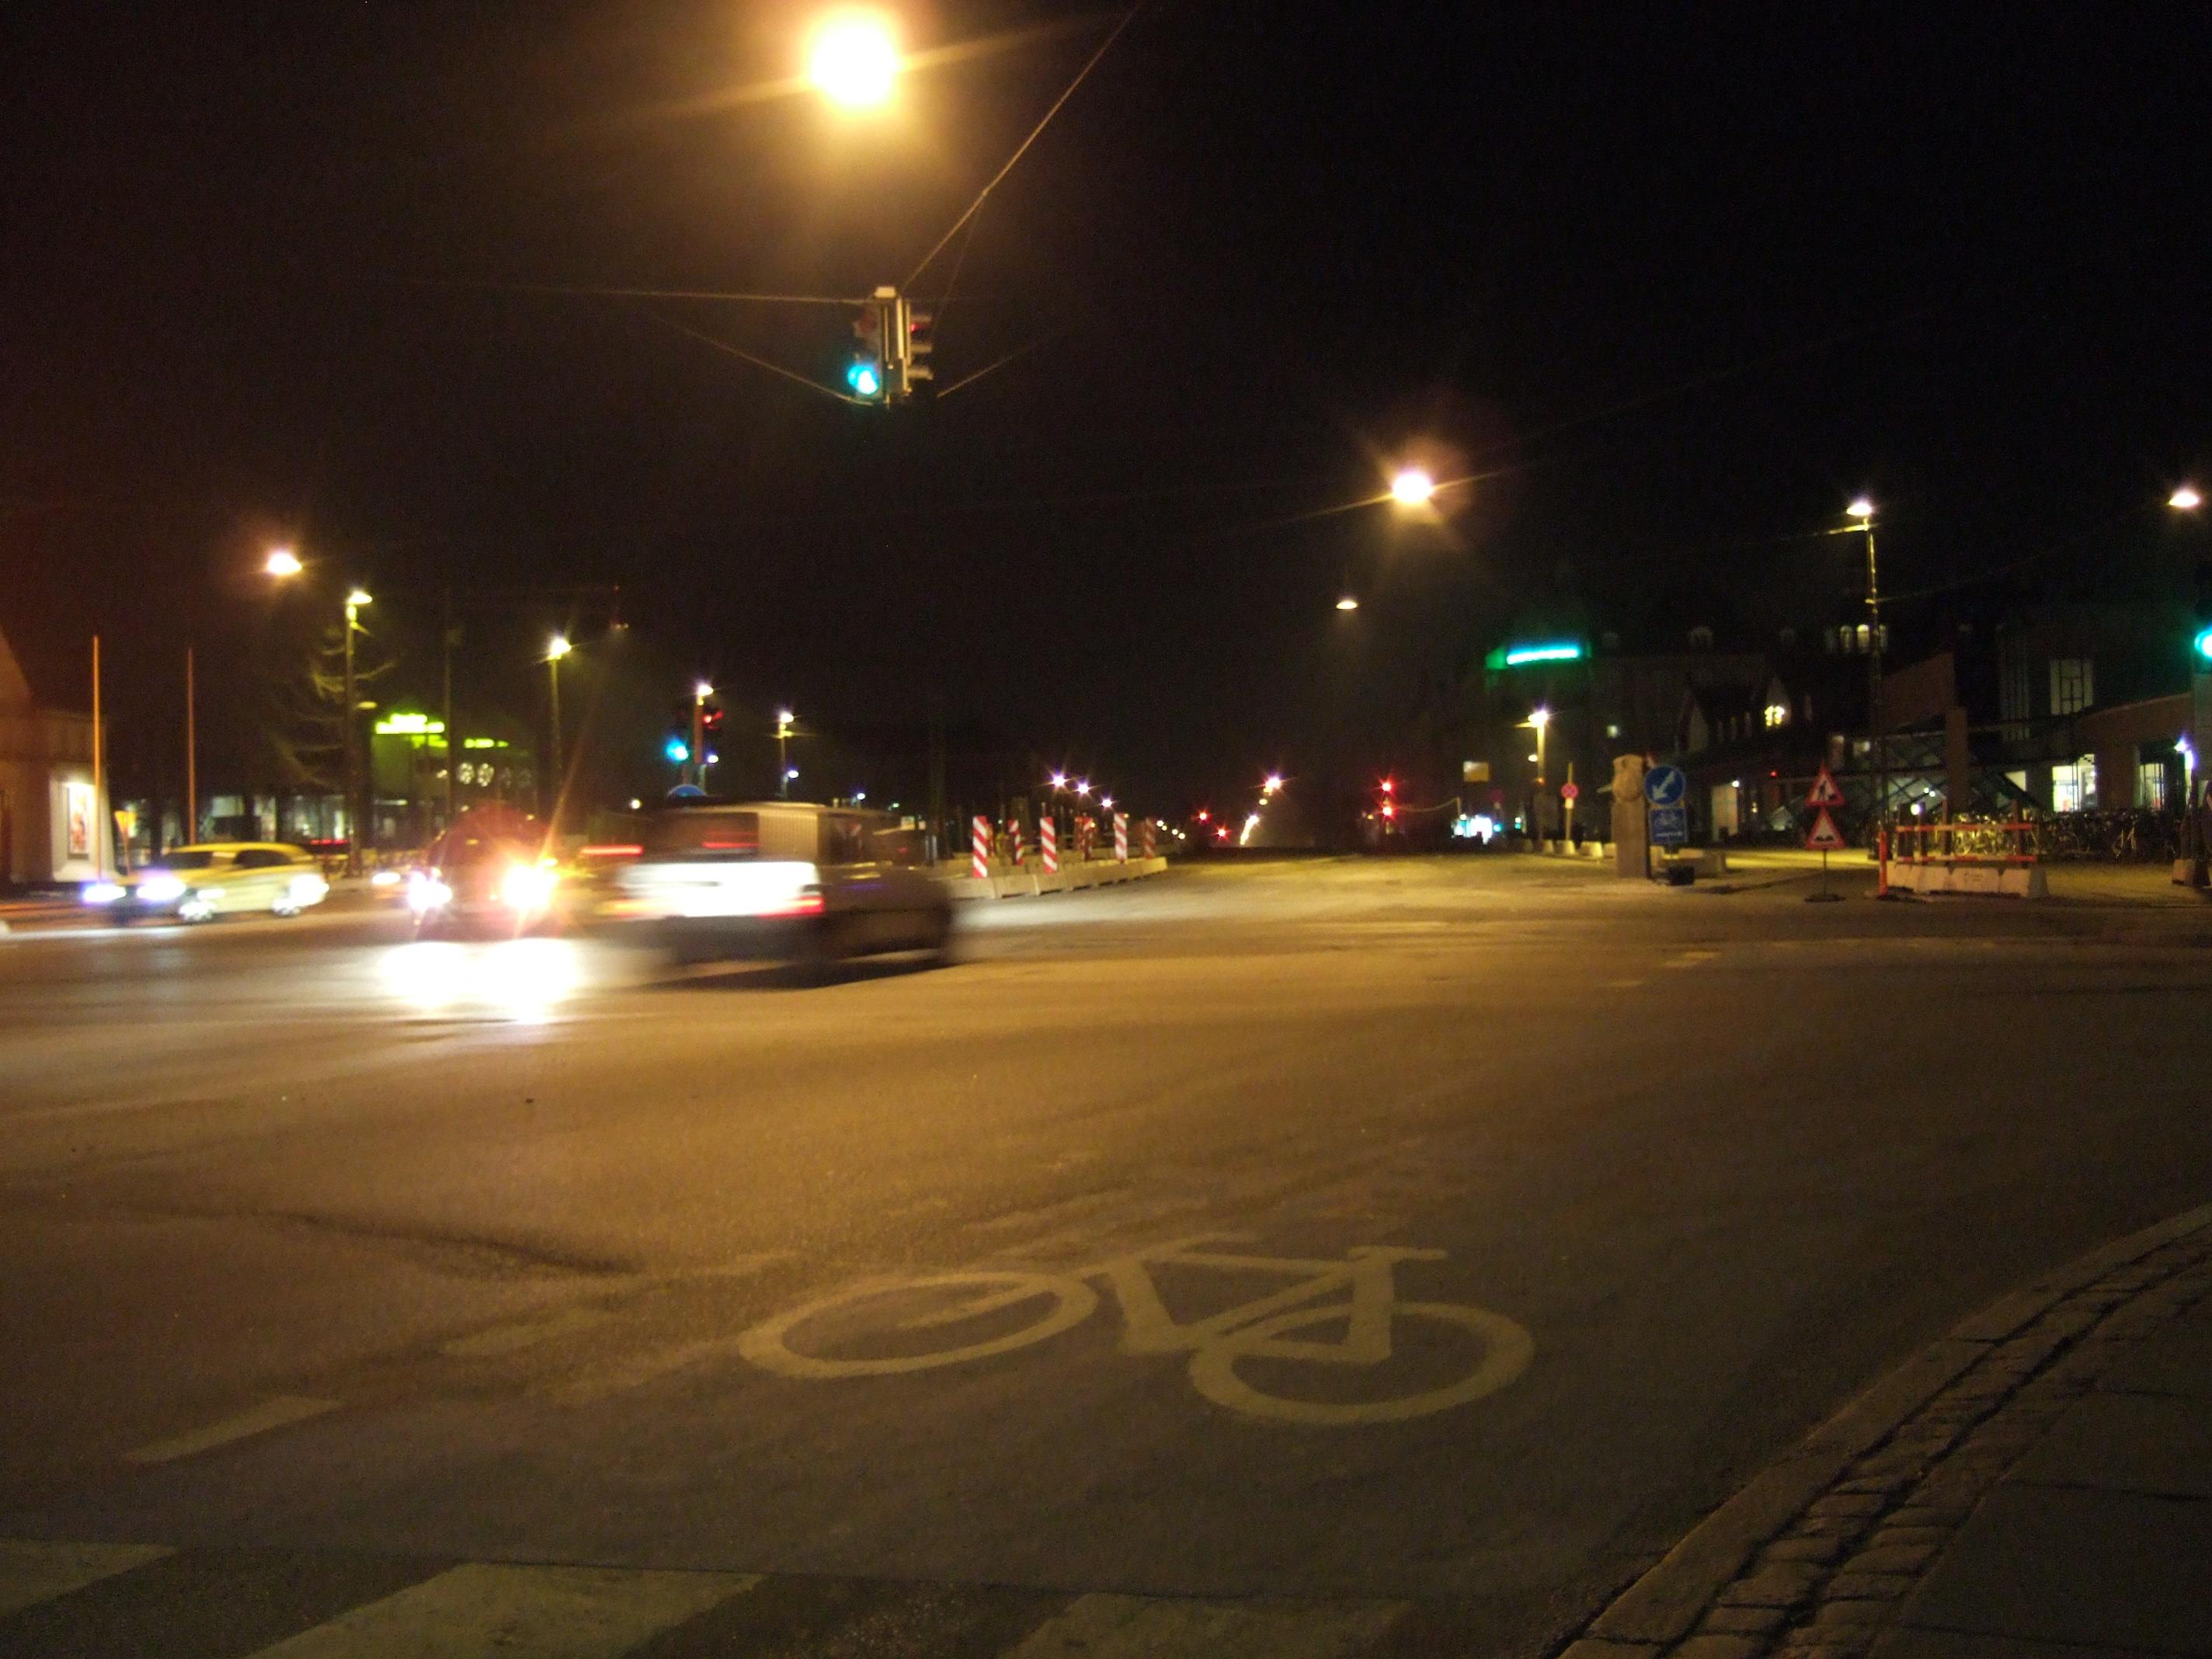 tabus city bike road car night